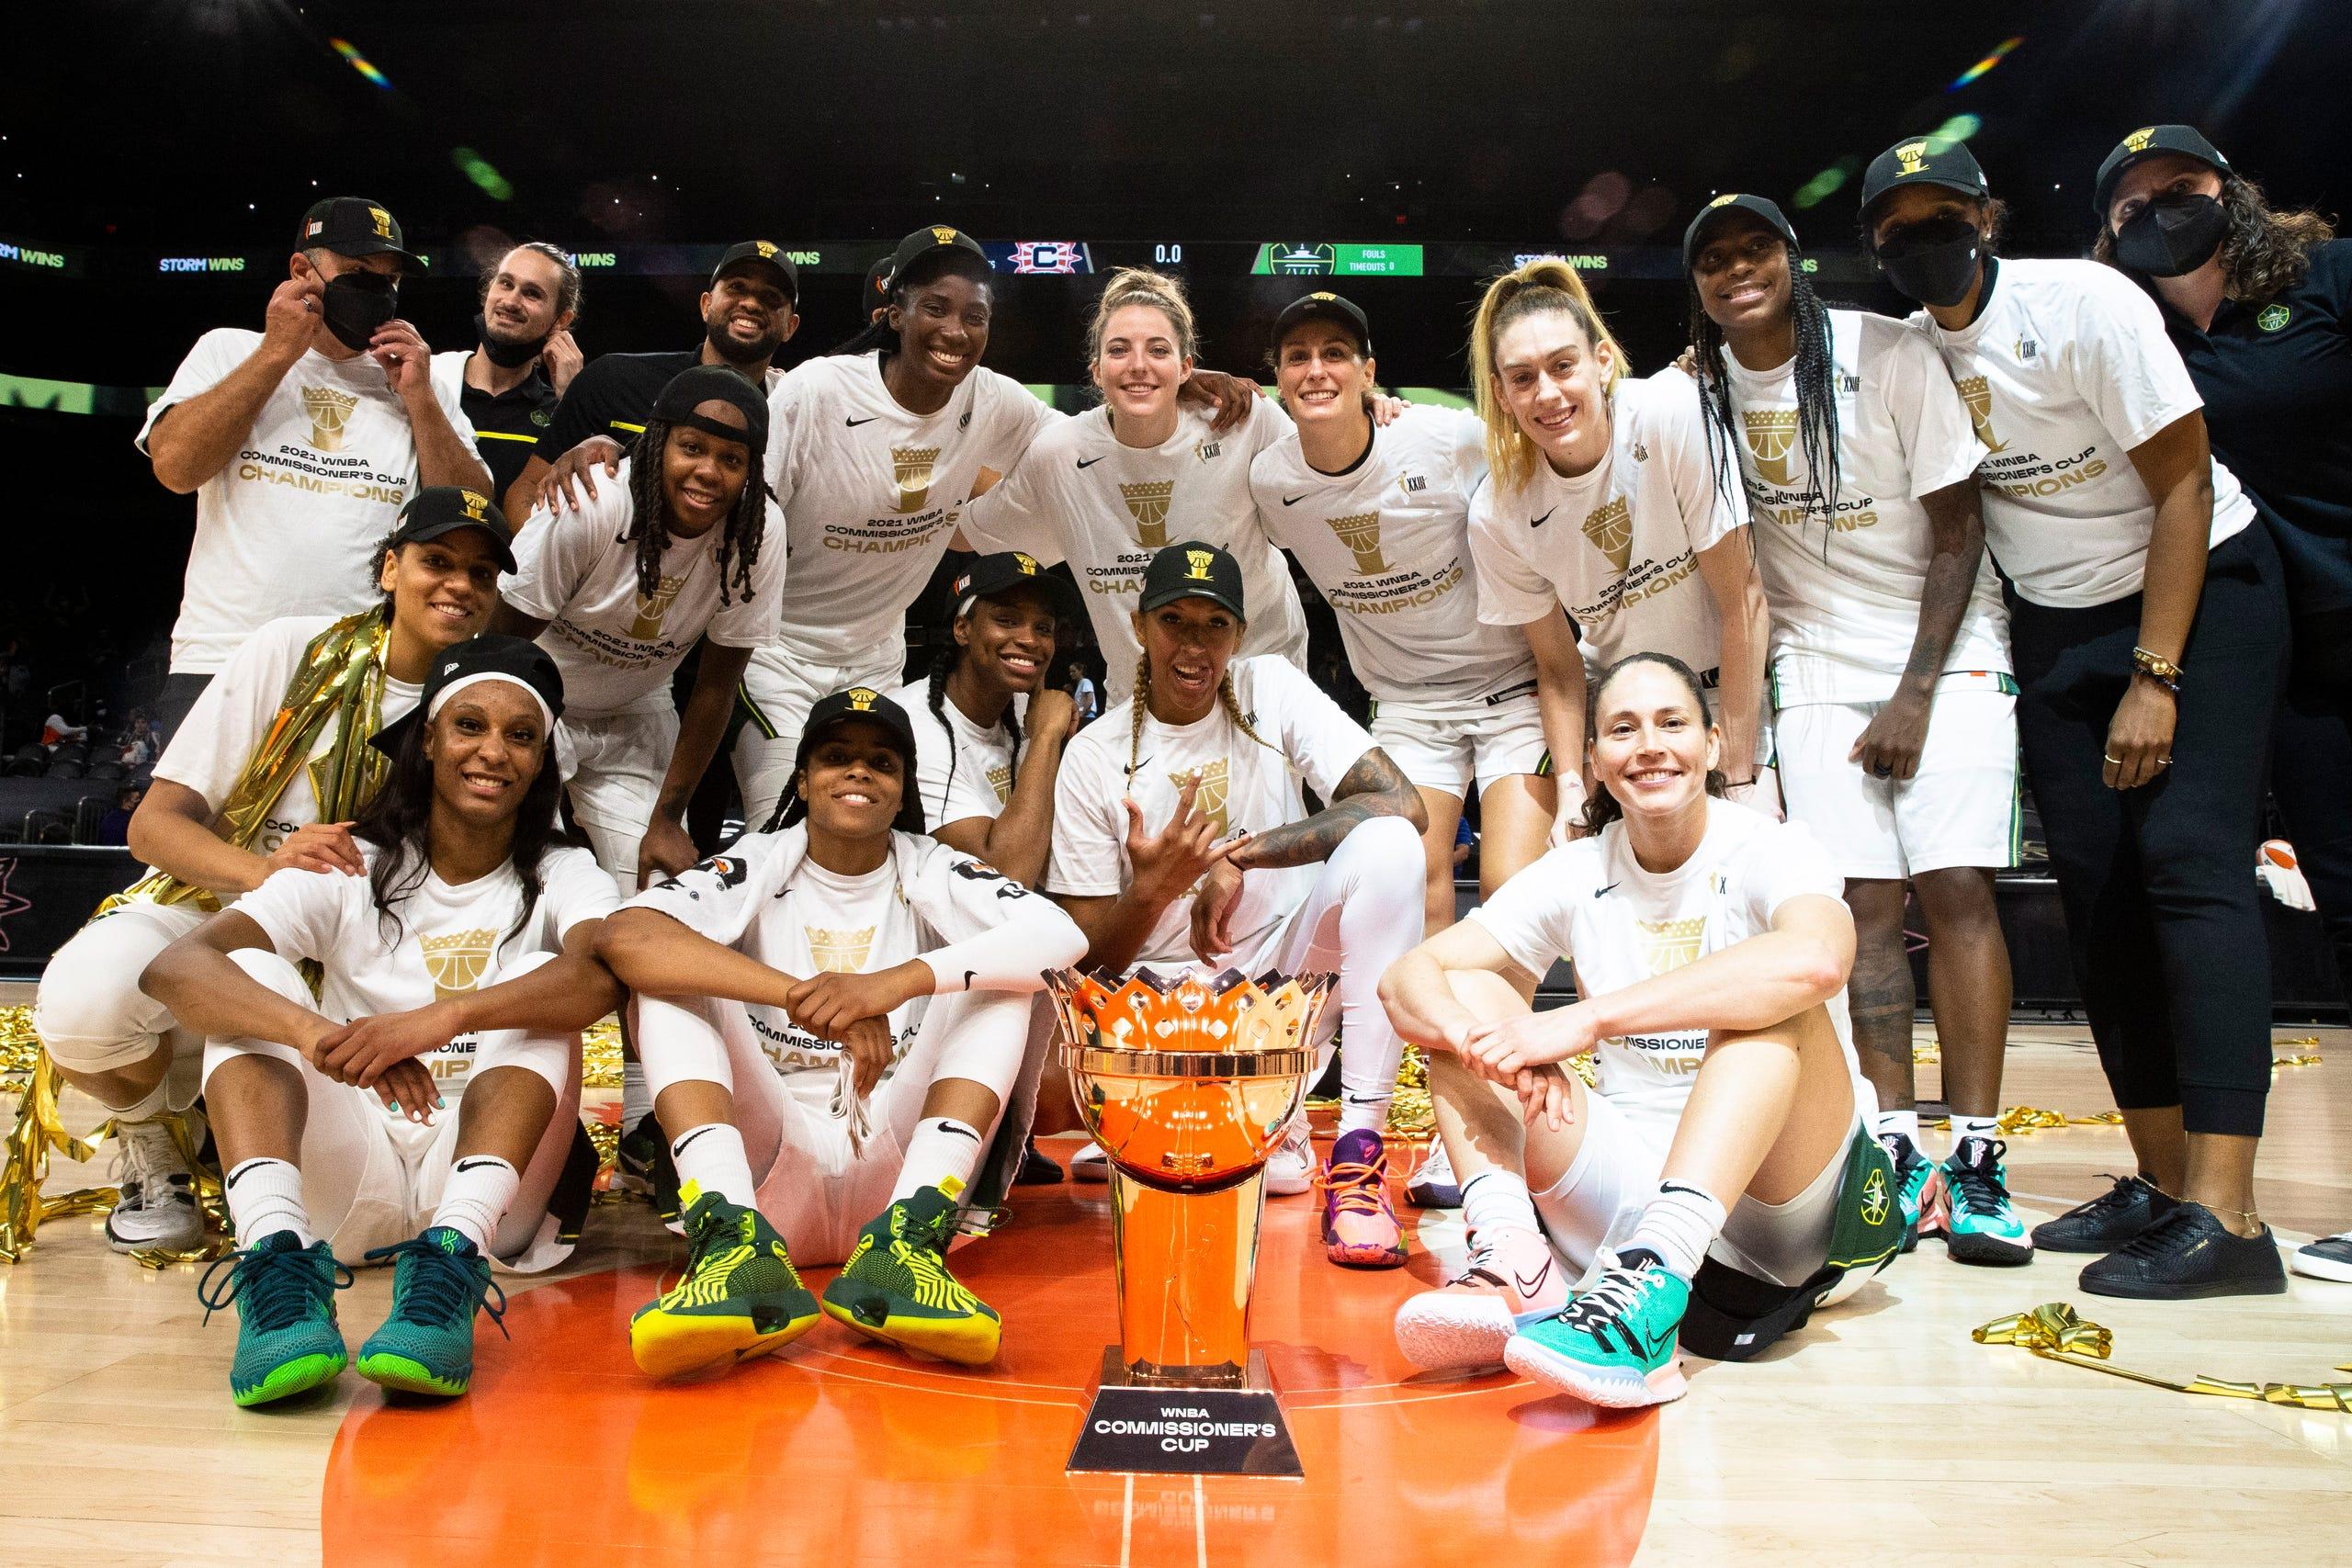 Photos: WNBA Commissioner's Cup